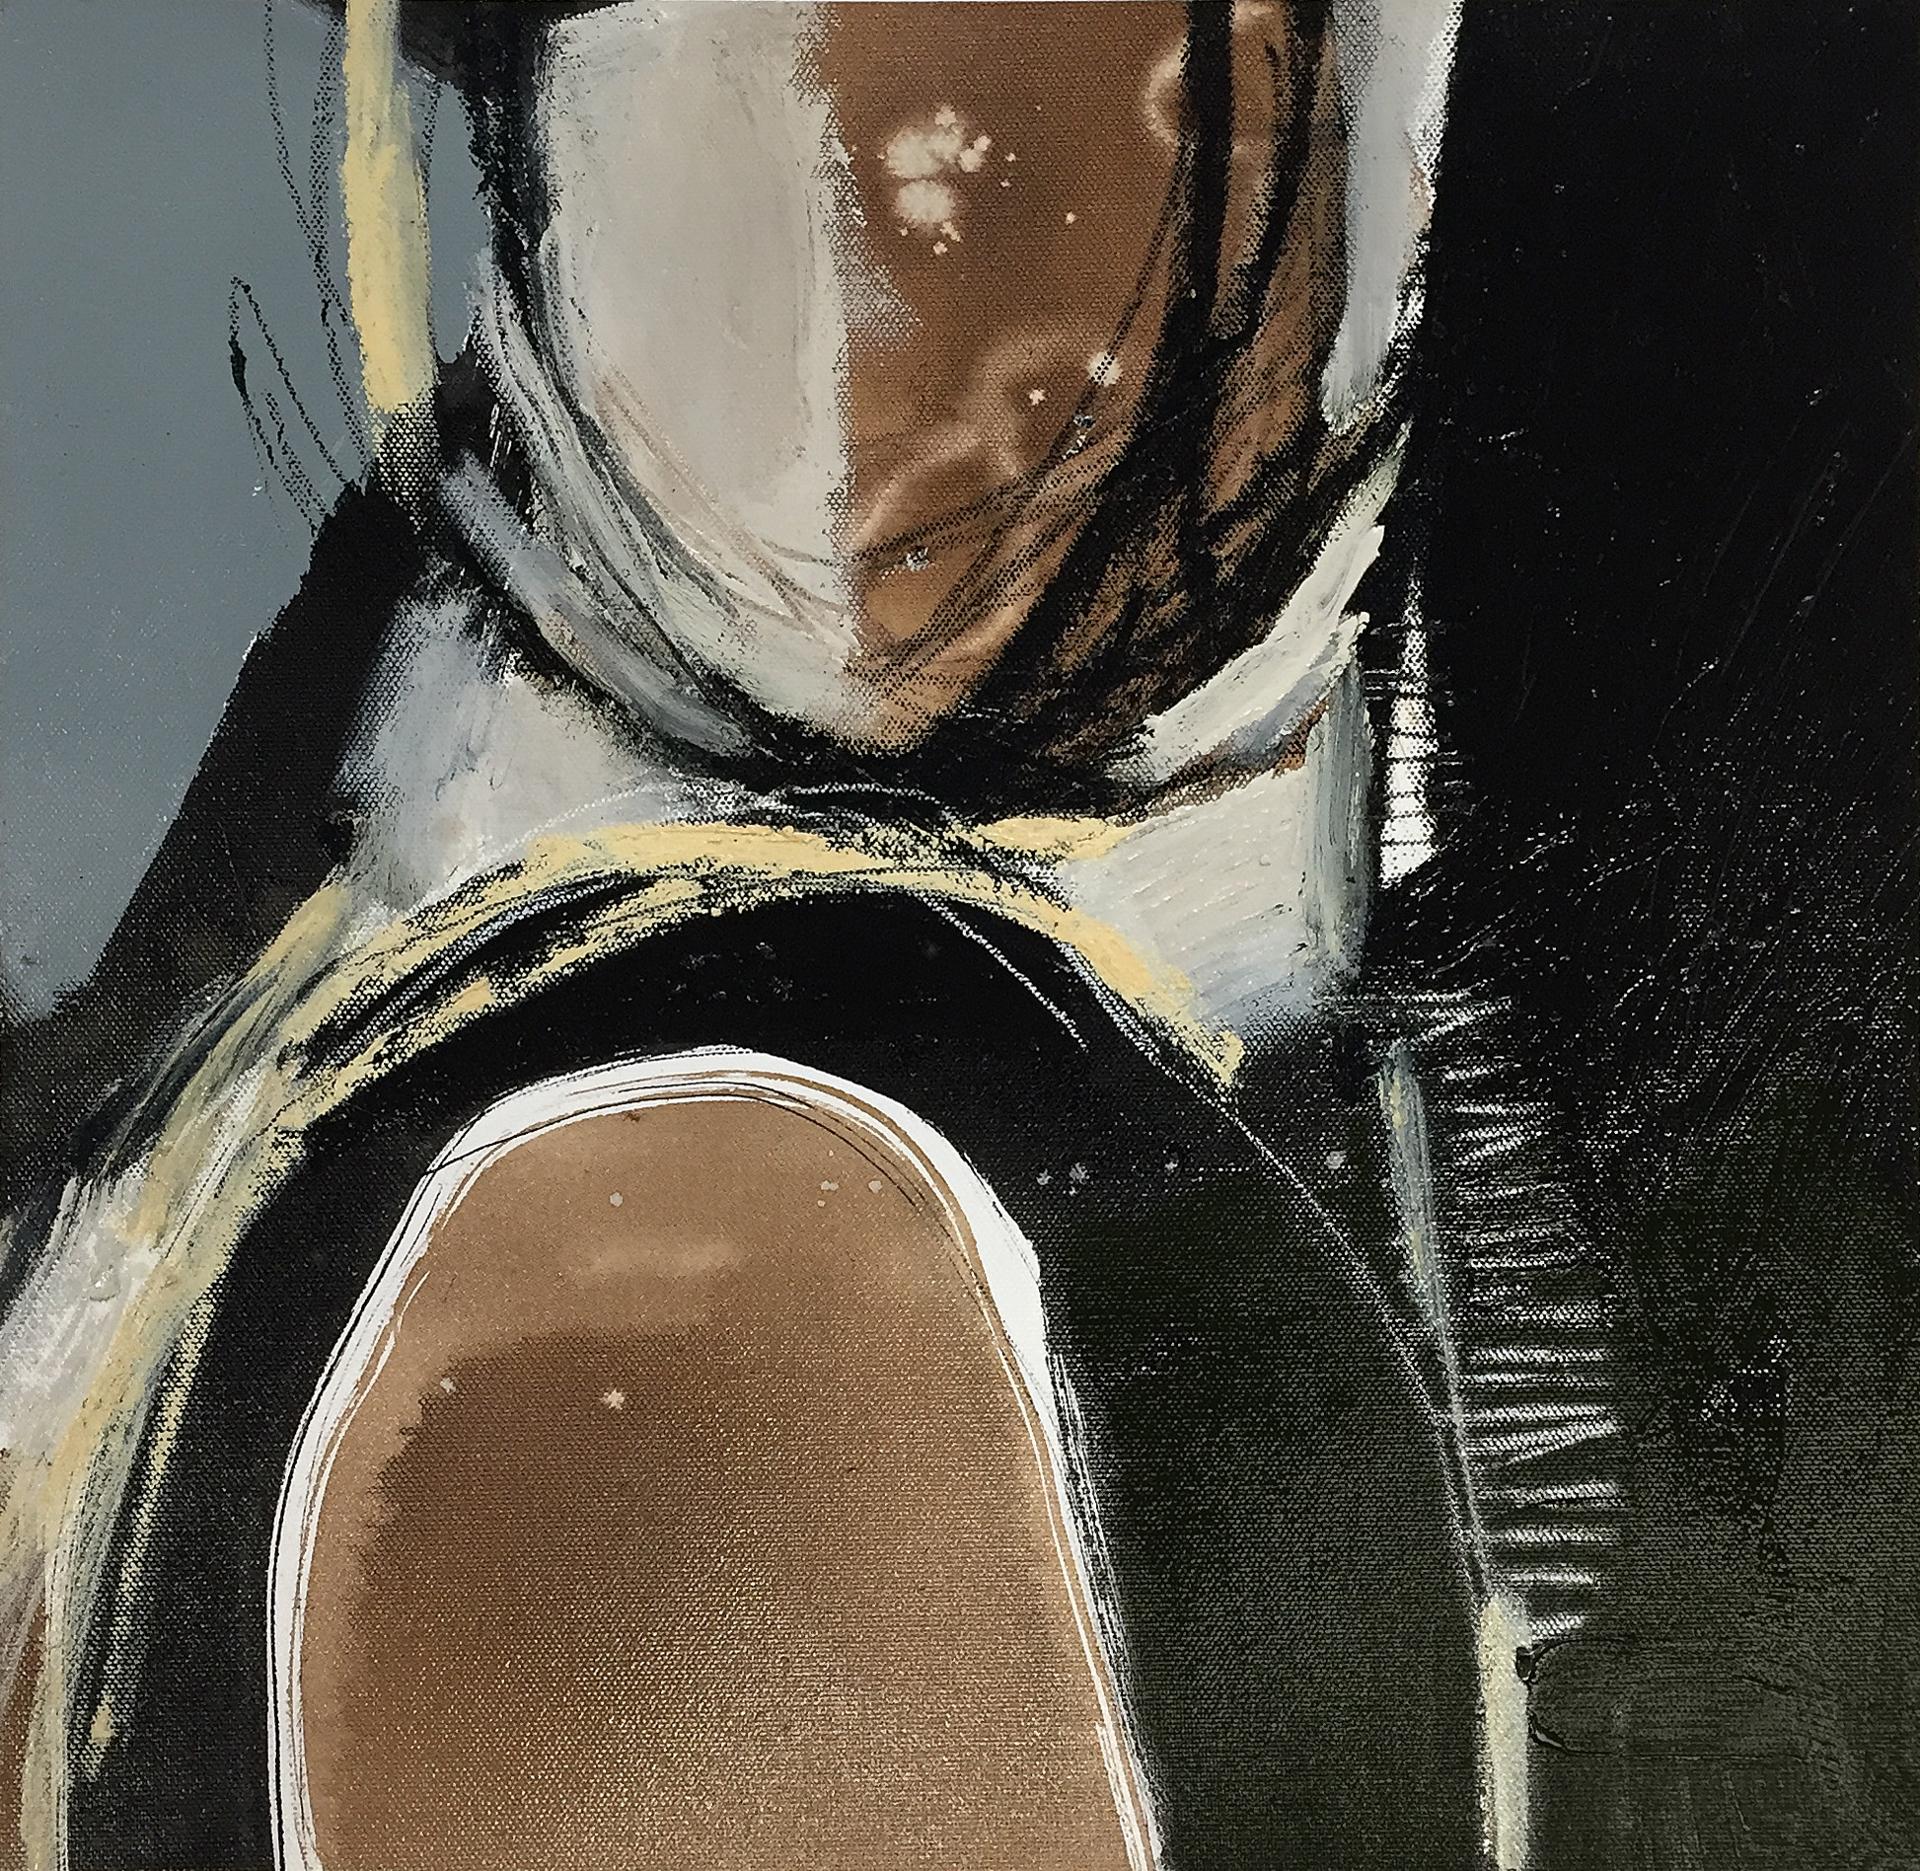 Untitled 198600 by Karen Roehl